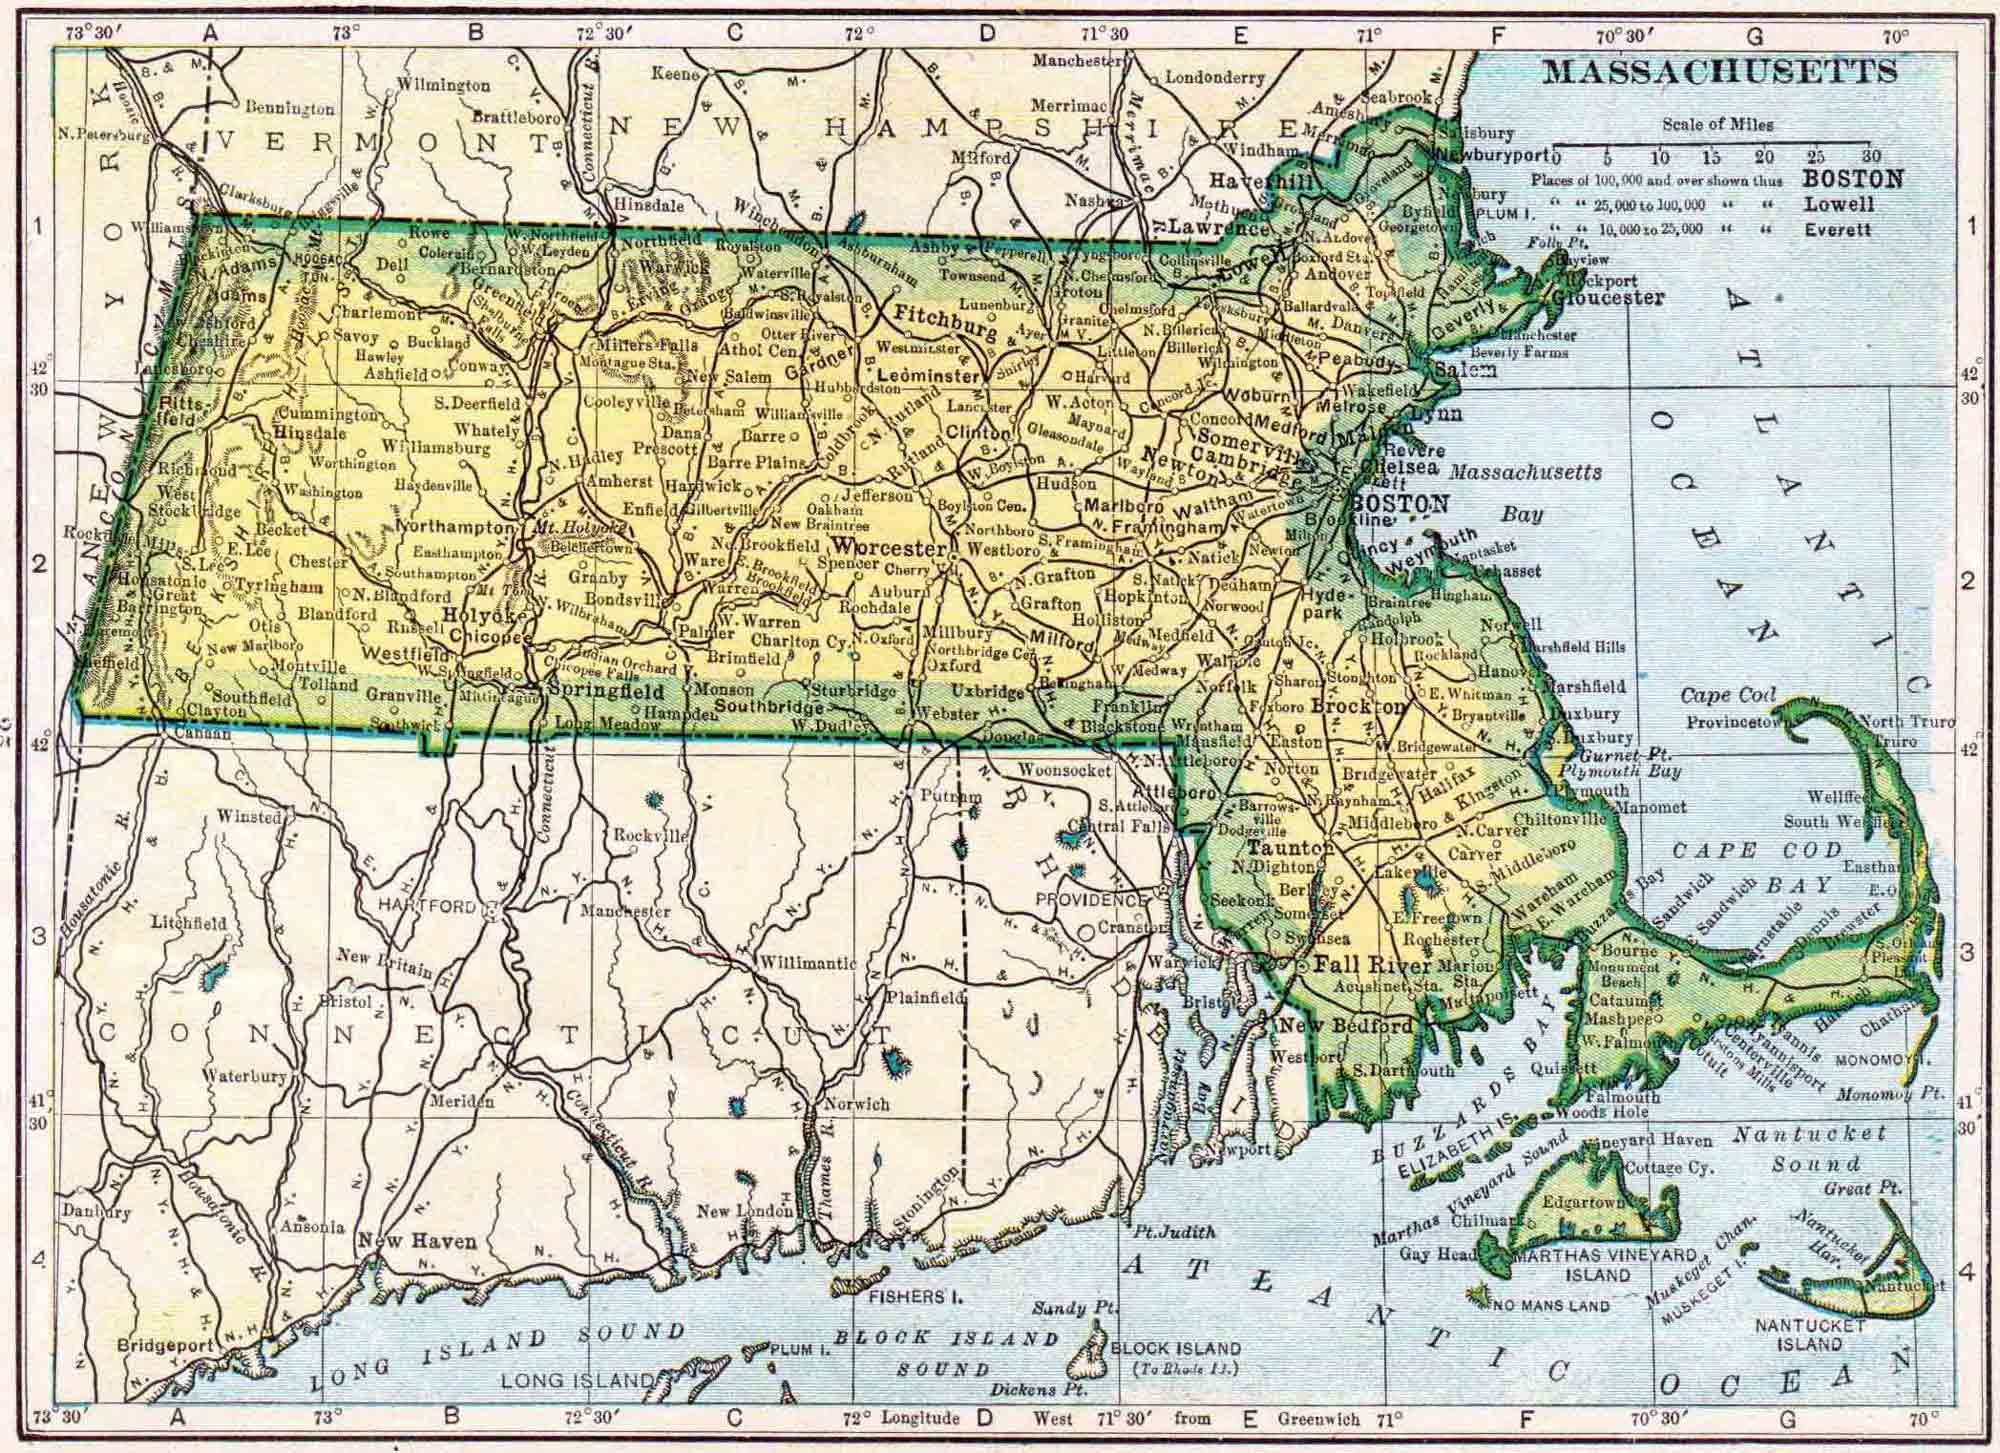 Machusetts Genealogy - Free Machusetts Genealogy ... on town of danvers, sign welcome to danvers, map of boston danvers, burlington map of eastern massachusetts danvers, map of reservoir danvers,